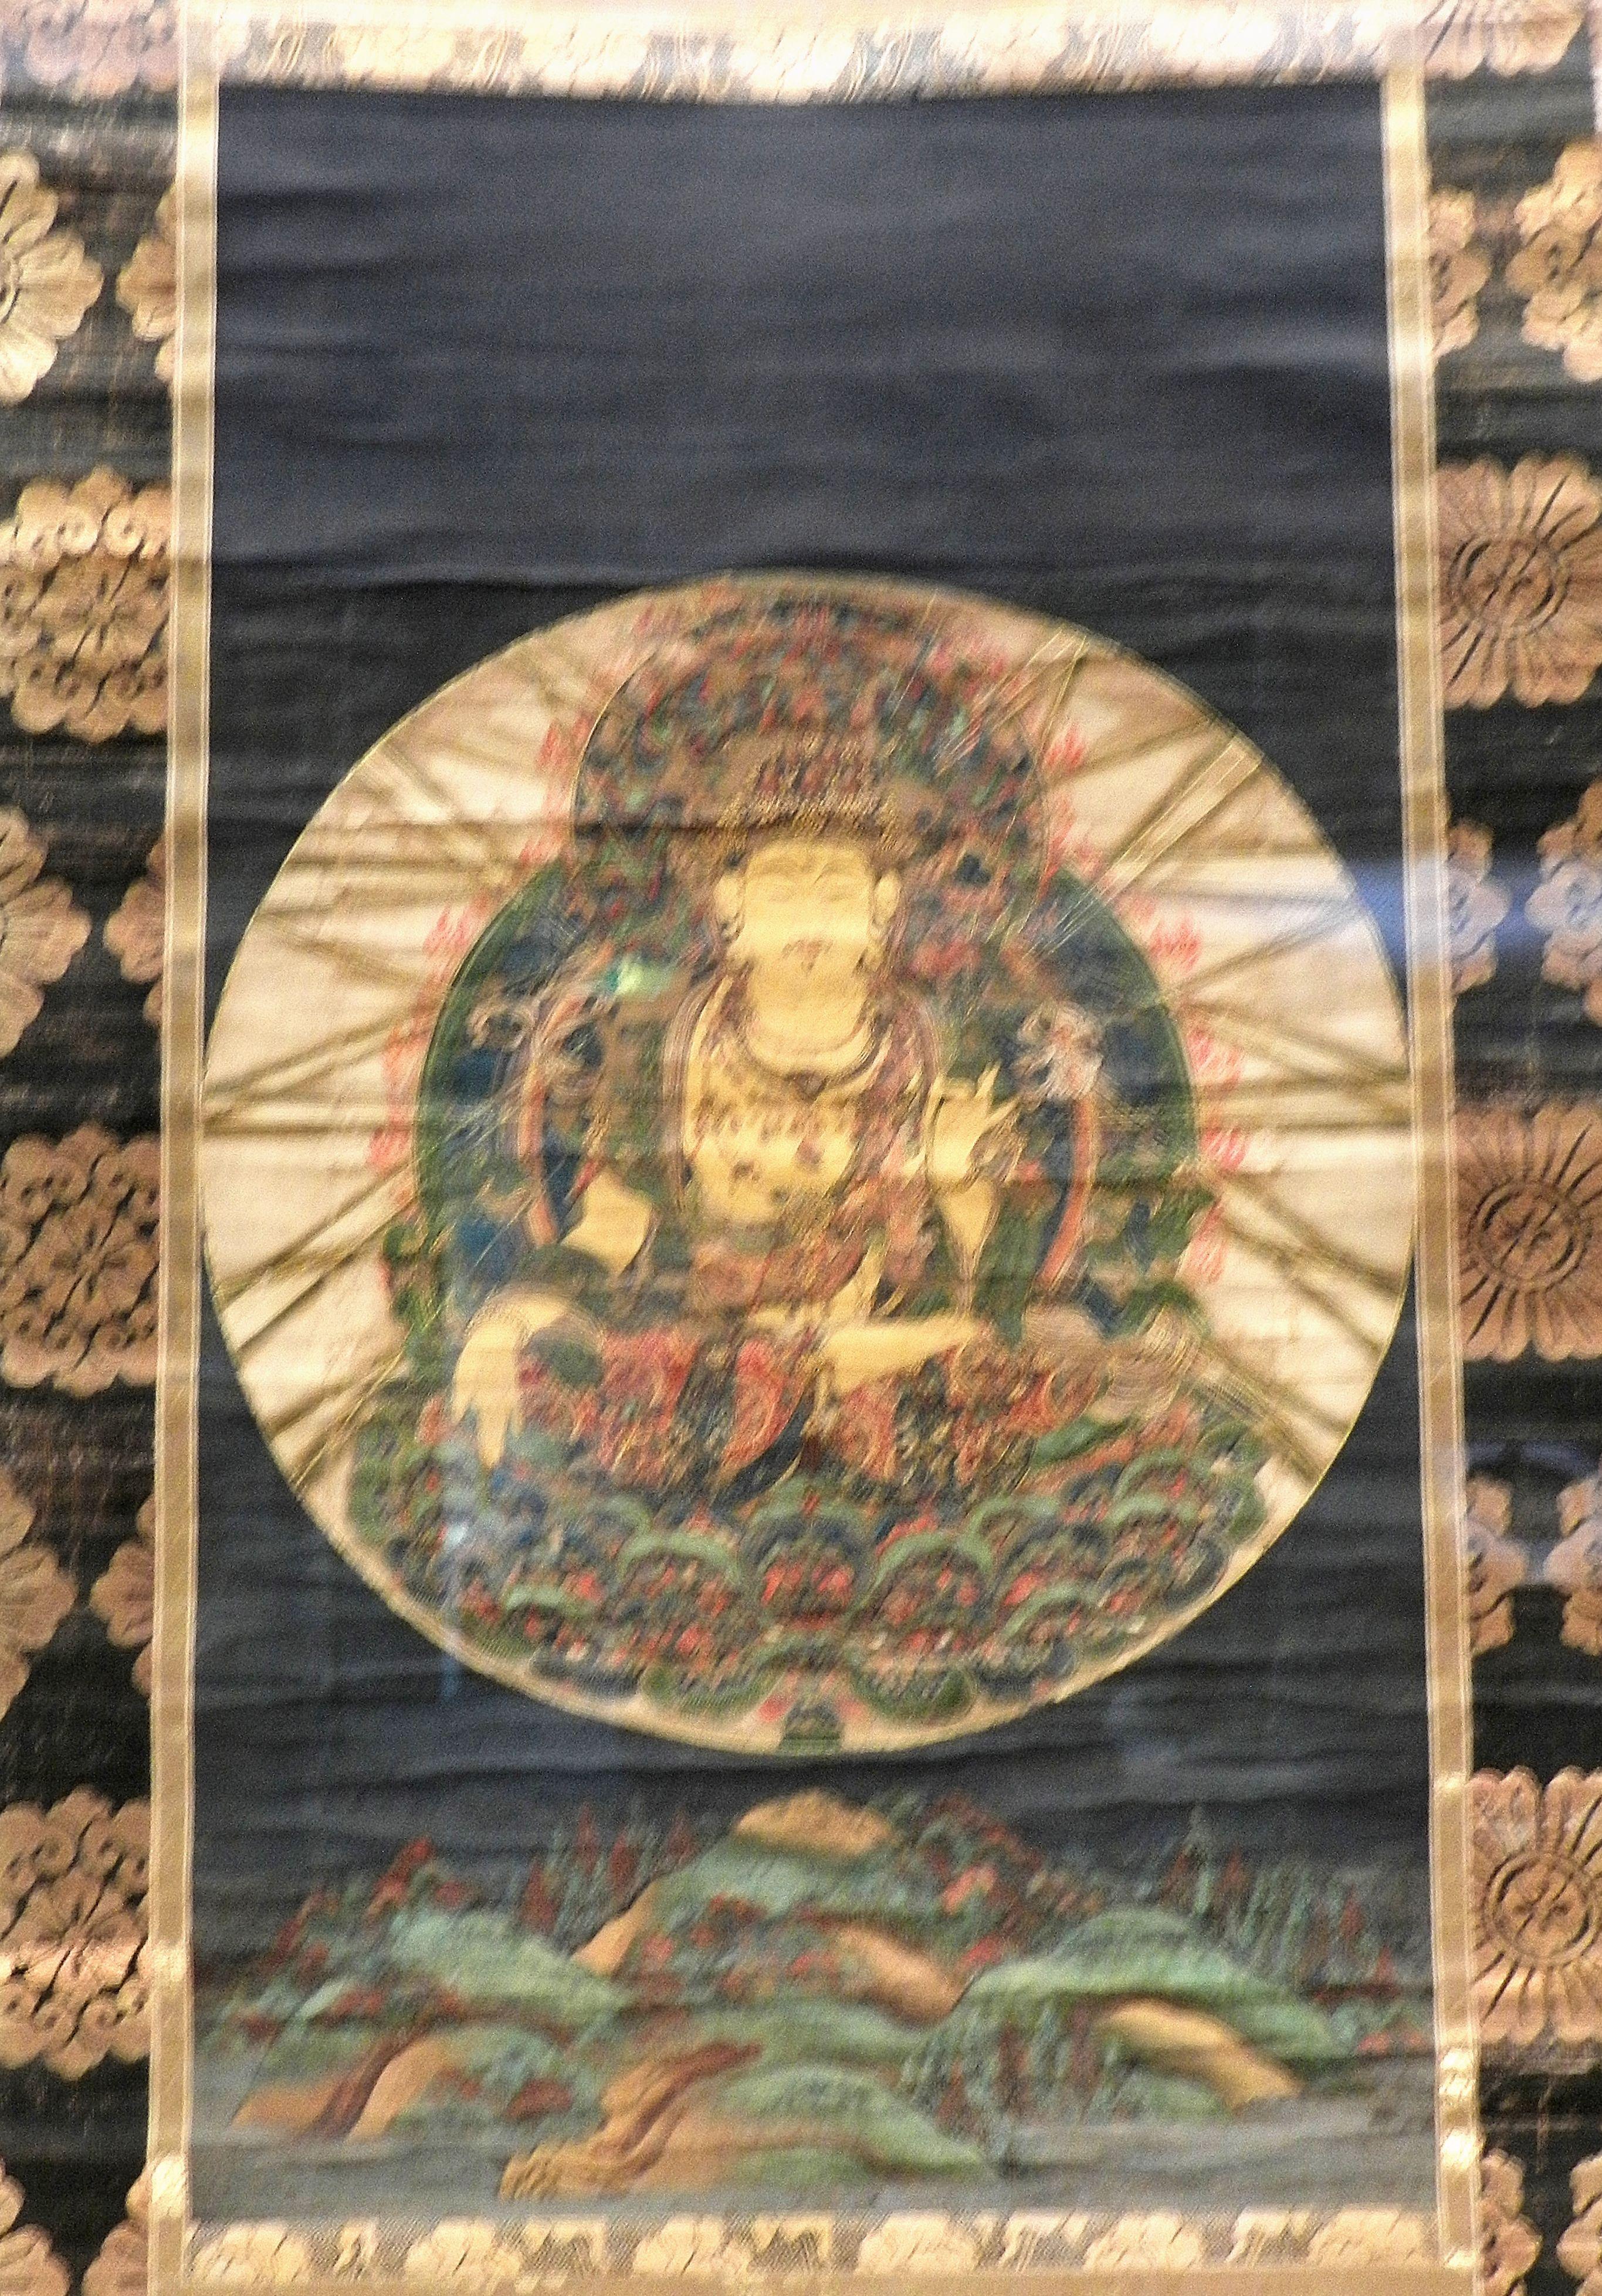 Akasagarbha (Kokuzo).